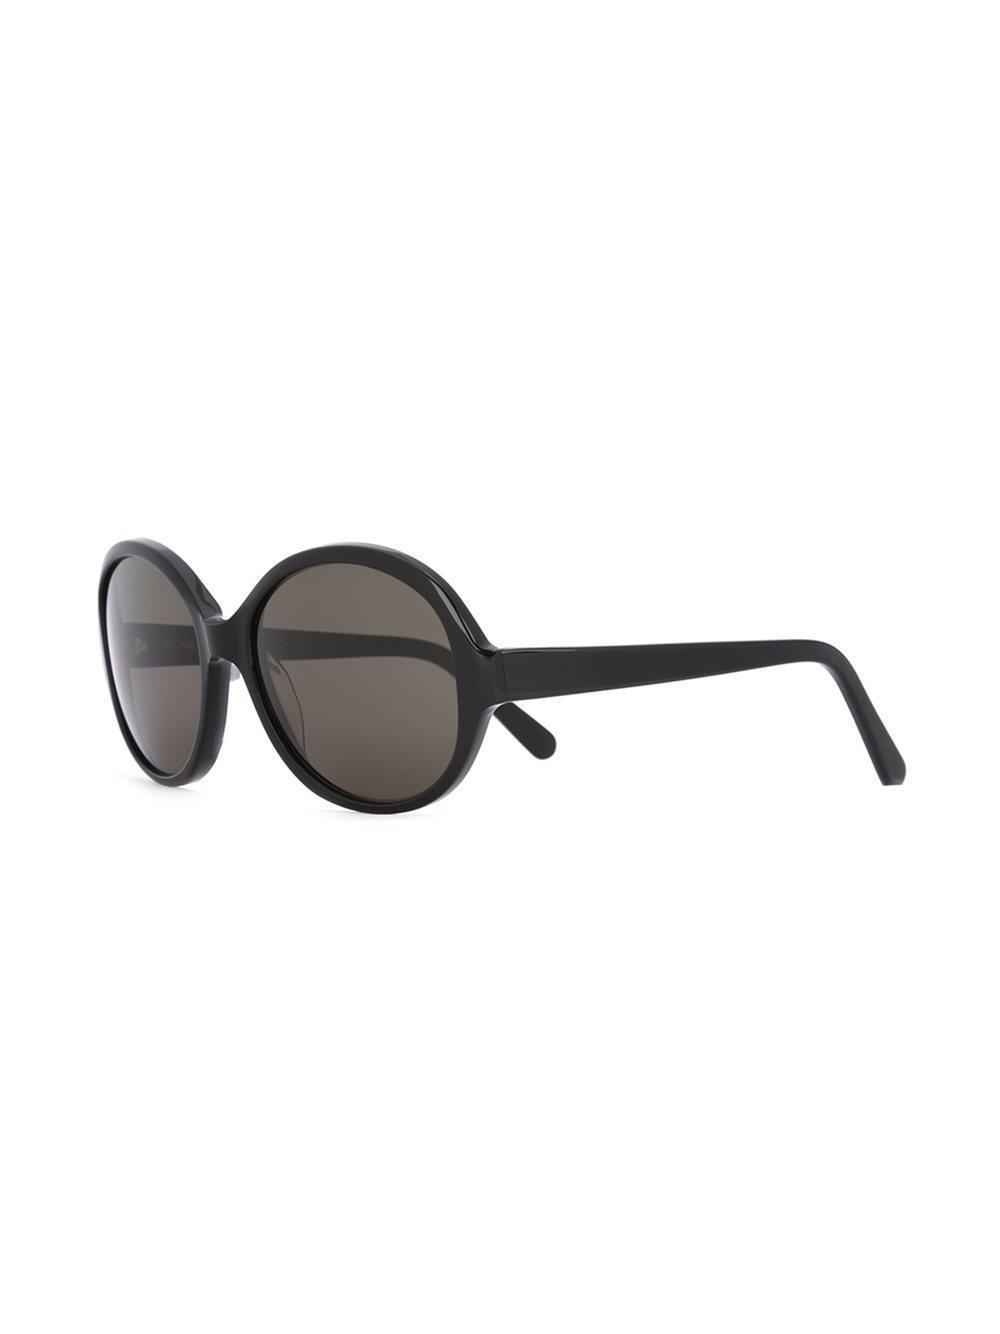 Selima Optique 'Jaqueline' sunglasses Hyper Online With Paypal Cheap Price Cheap Sale rAlNCoYeu